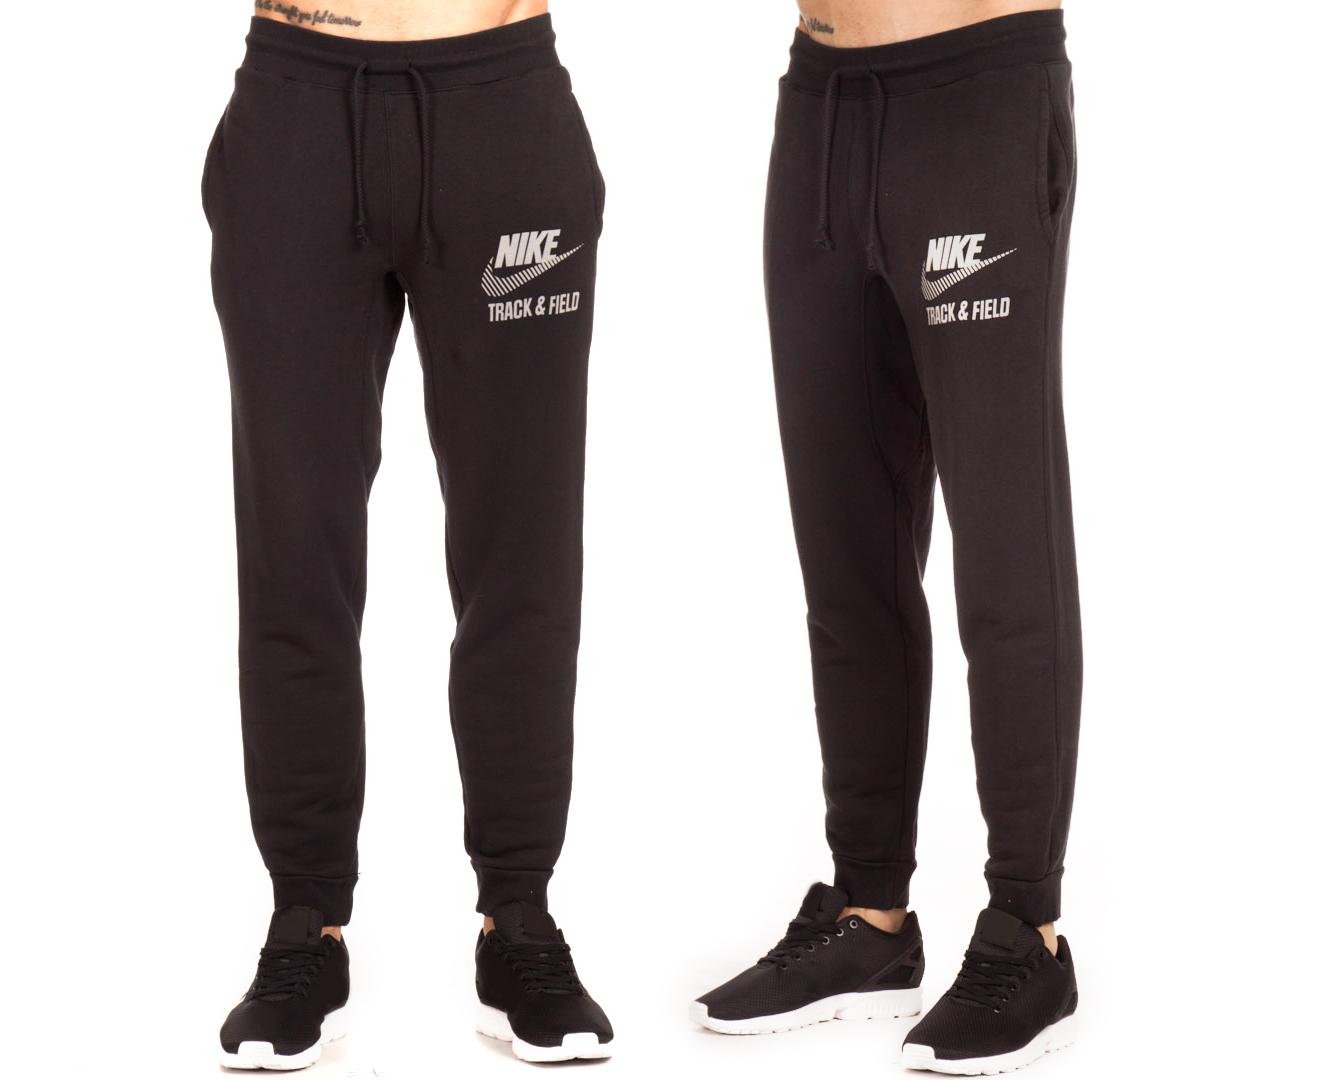 Original CatchOfTheDay.com.au | Nike Womenu0026#39;s Track U0026 Field Pant - Black